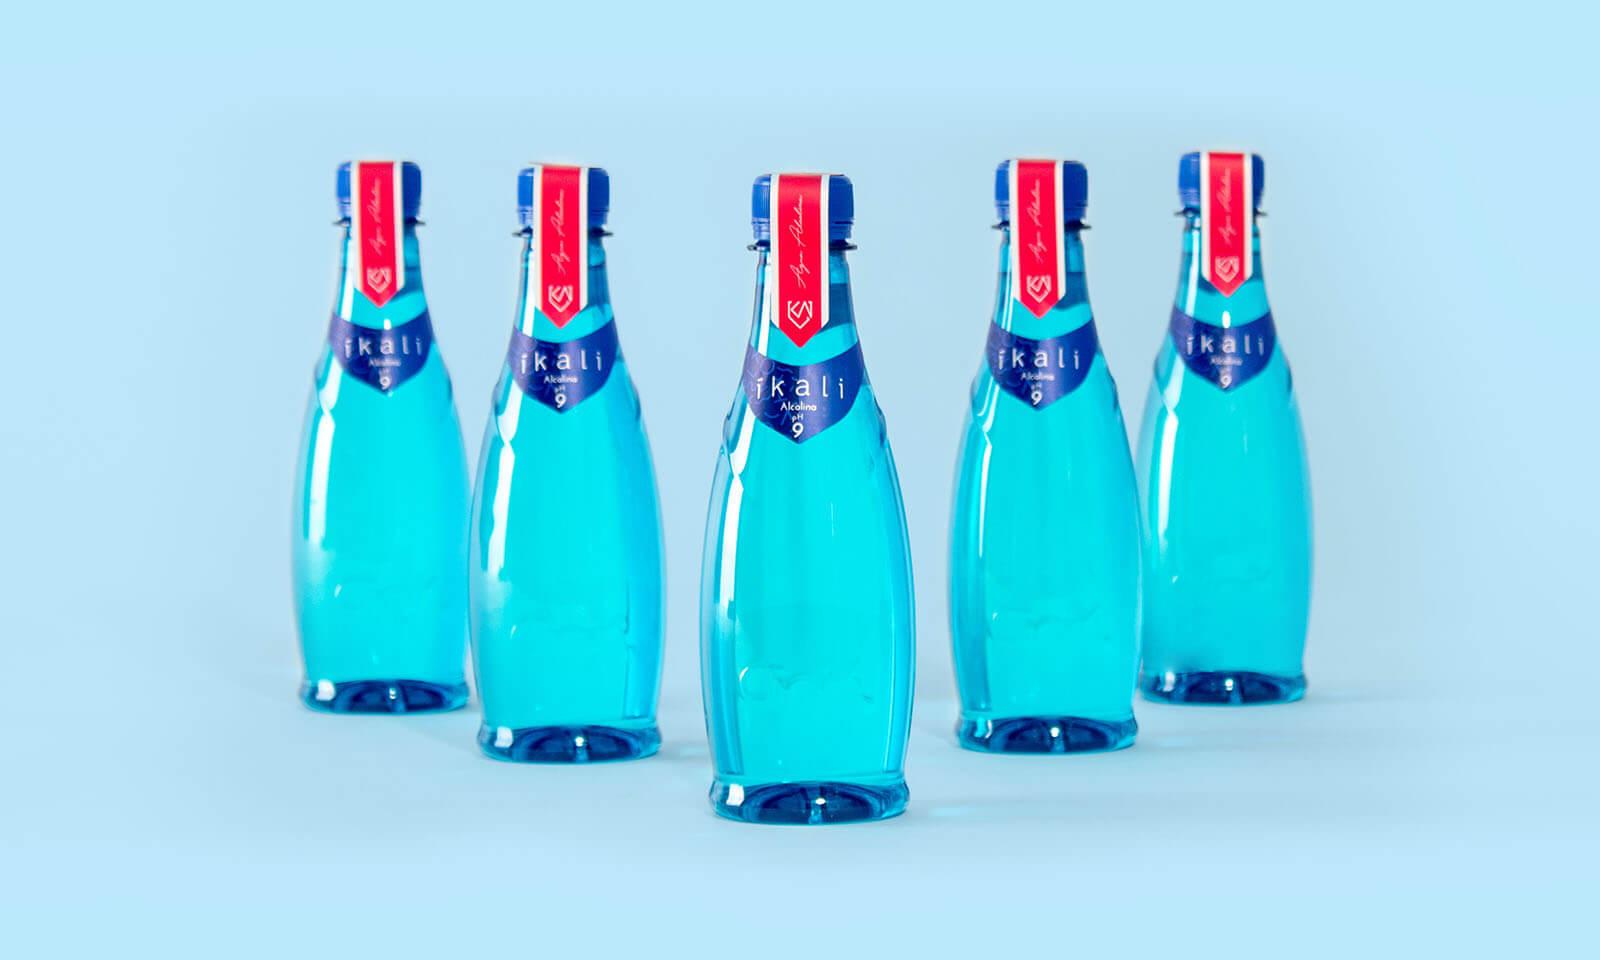 Íkali // Water Bottles